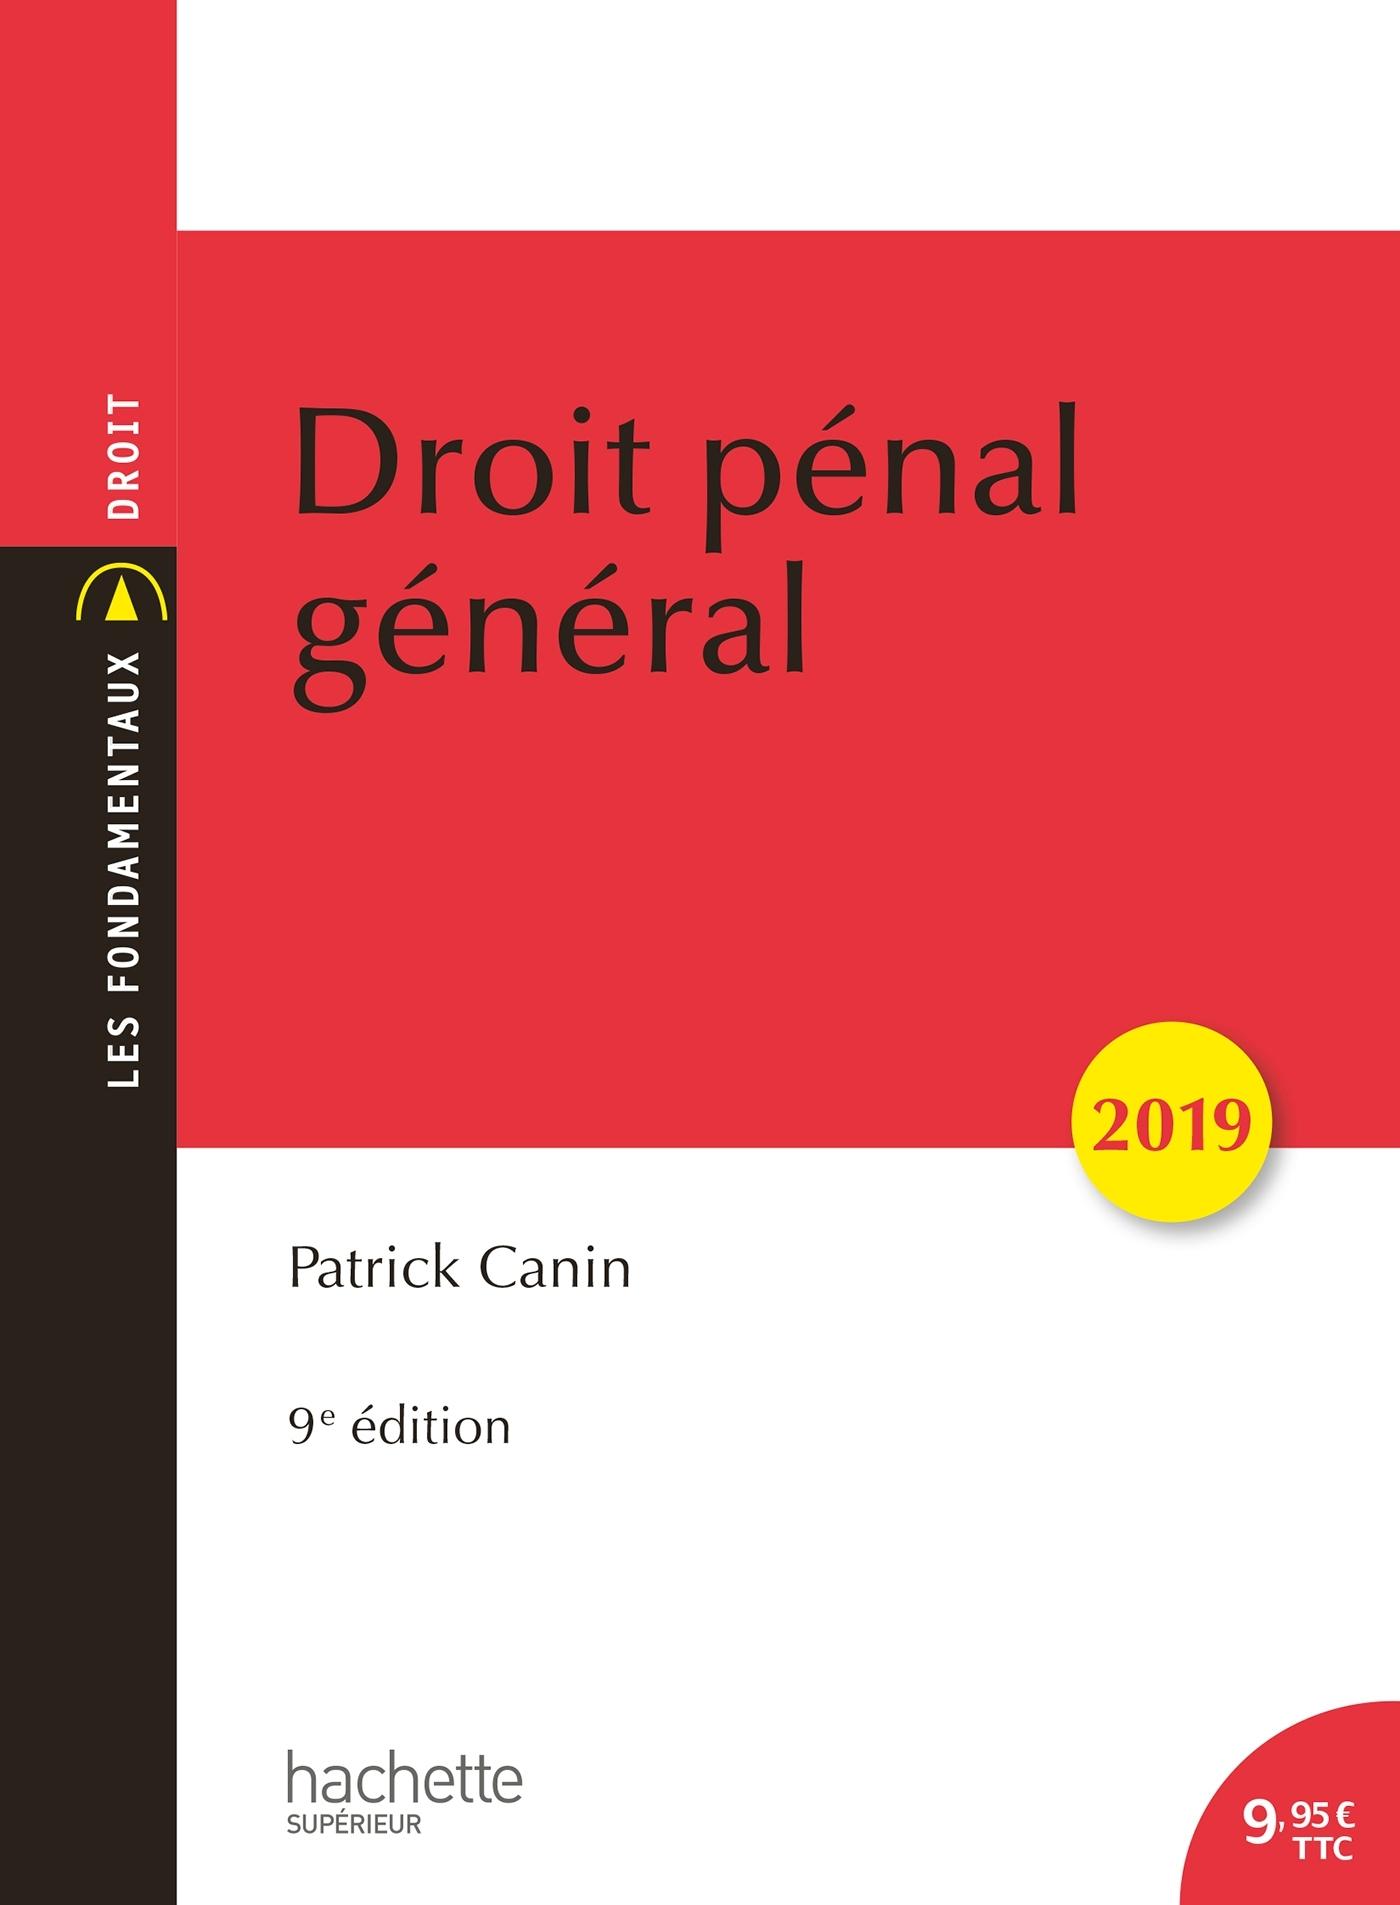 DROIT PENAL GENERAL 2019 (9E EDITION)